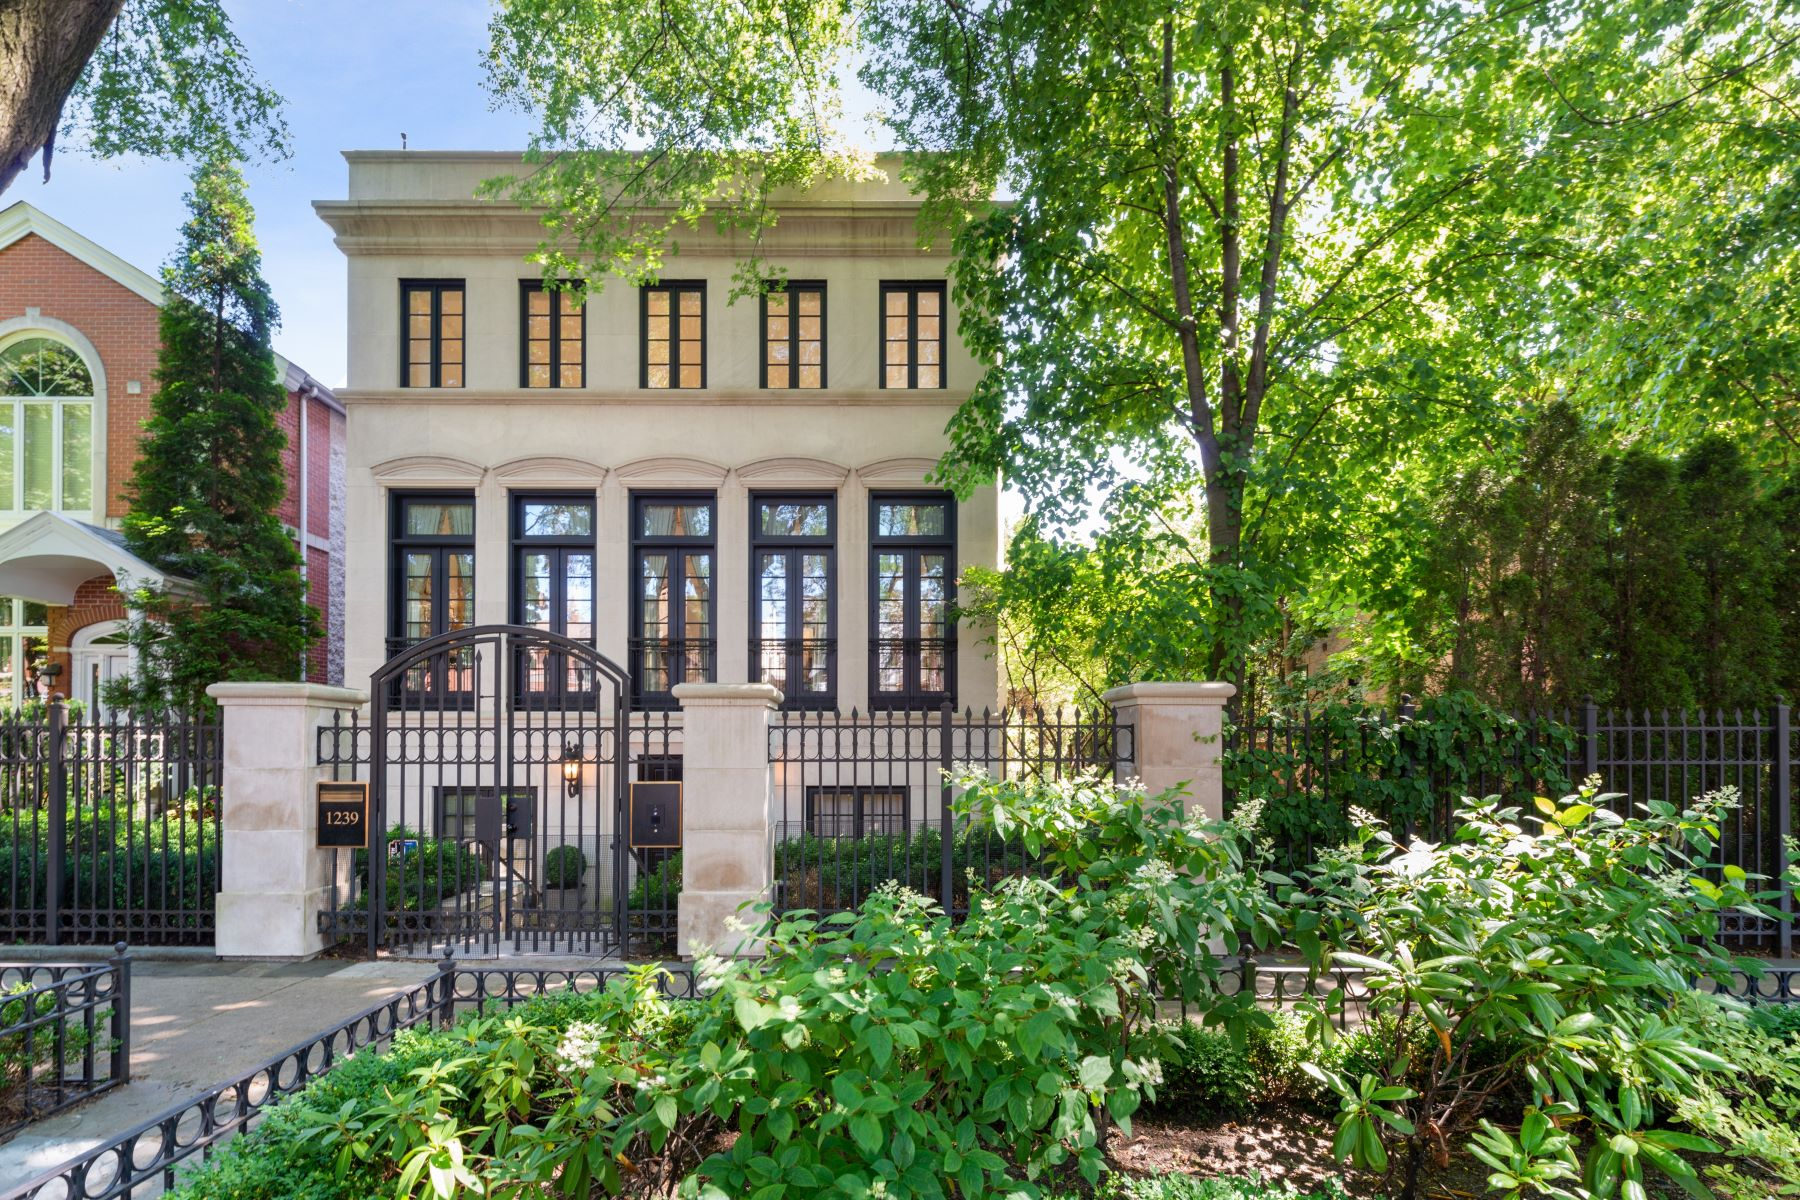 Single Family Homes por un Venta en Sensational Urban Villa 1239 W Altgeld Street Chicago, Illinois 60614 Estados Unidos